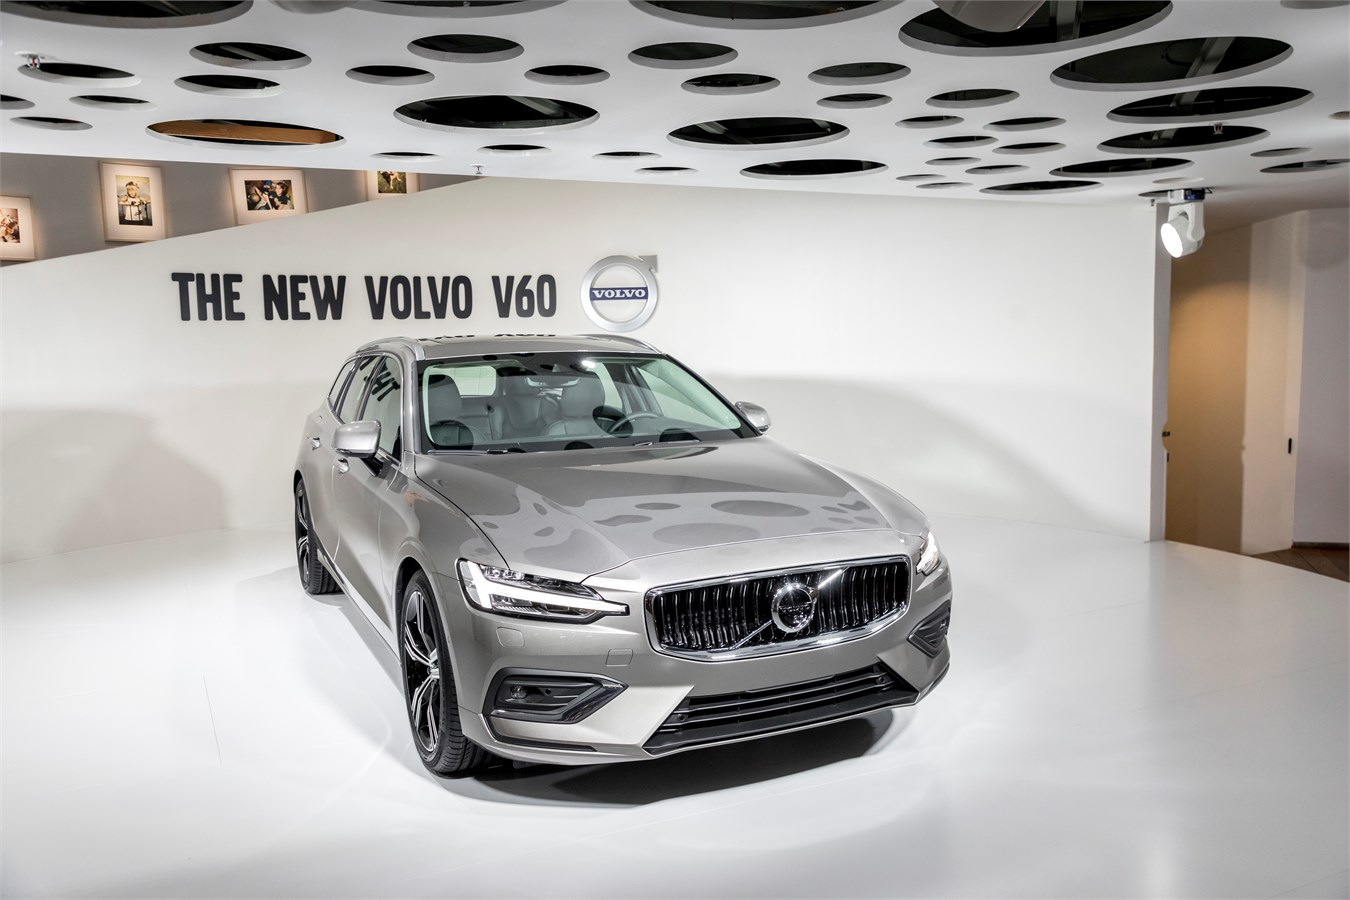 V60 Reveal - Stockholm - février 2018 - T6 - Photos@Ace Team pour Volvo Car France